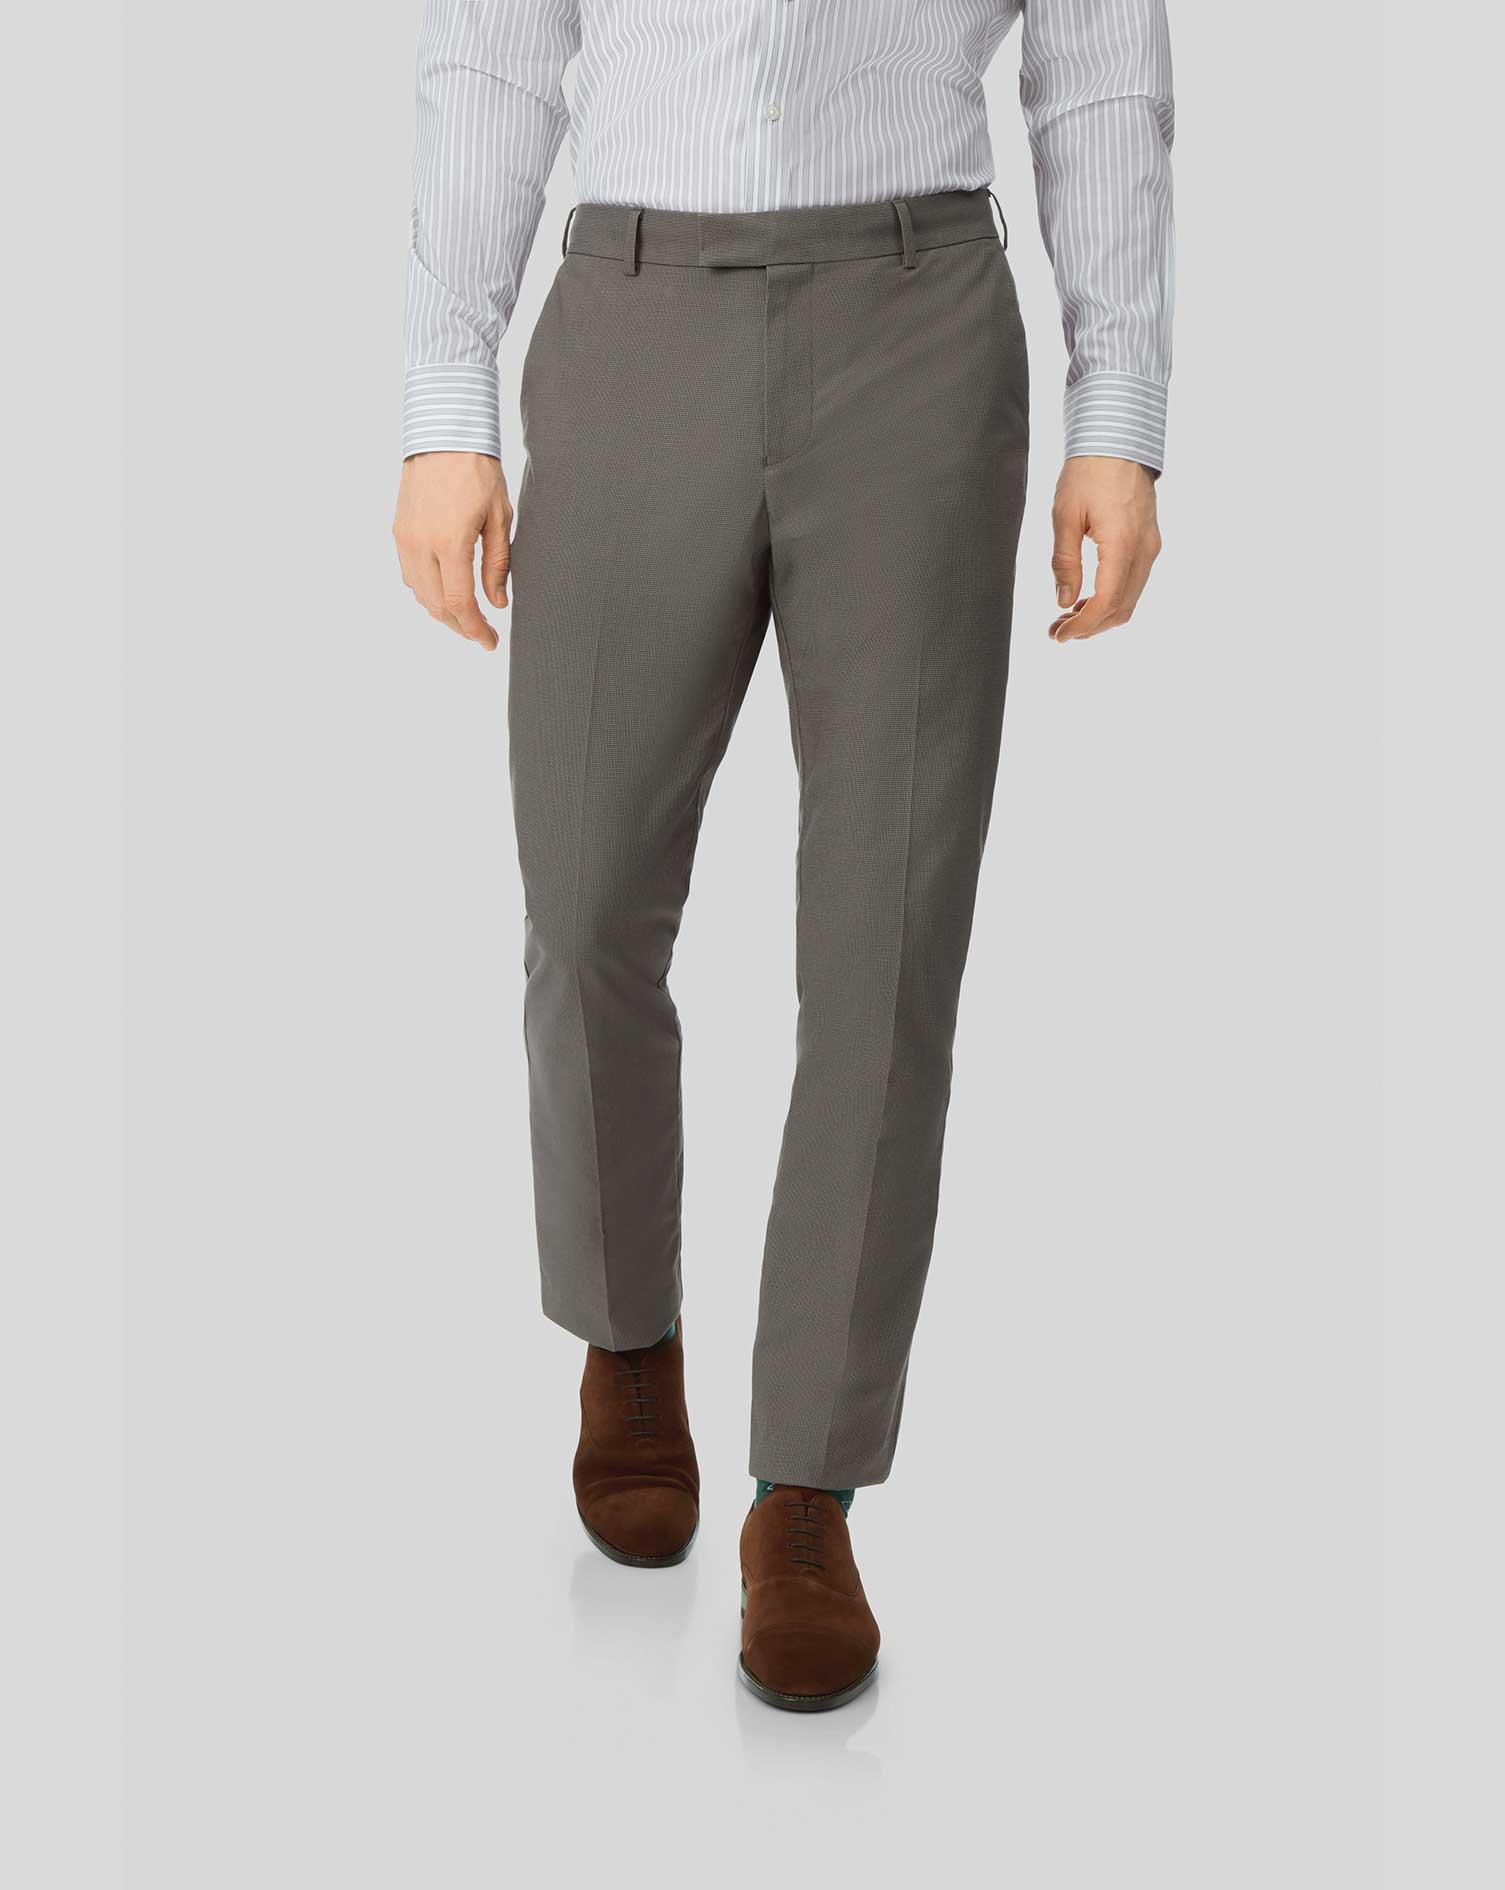 Cotton Non-Iron Stretch Trousers - Dark Brown